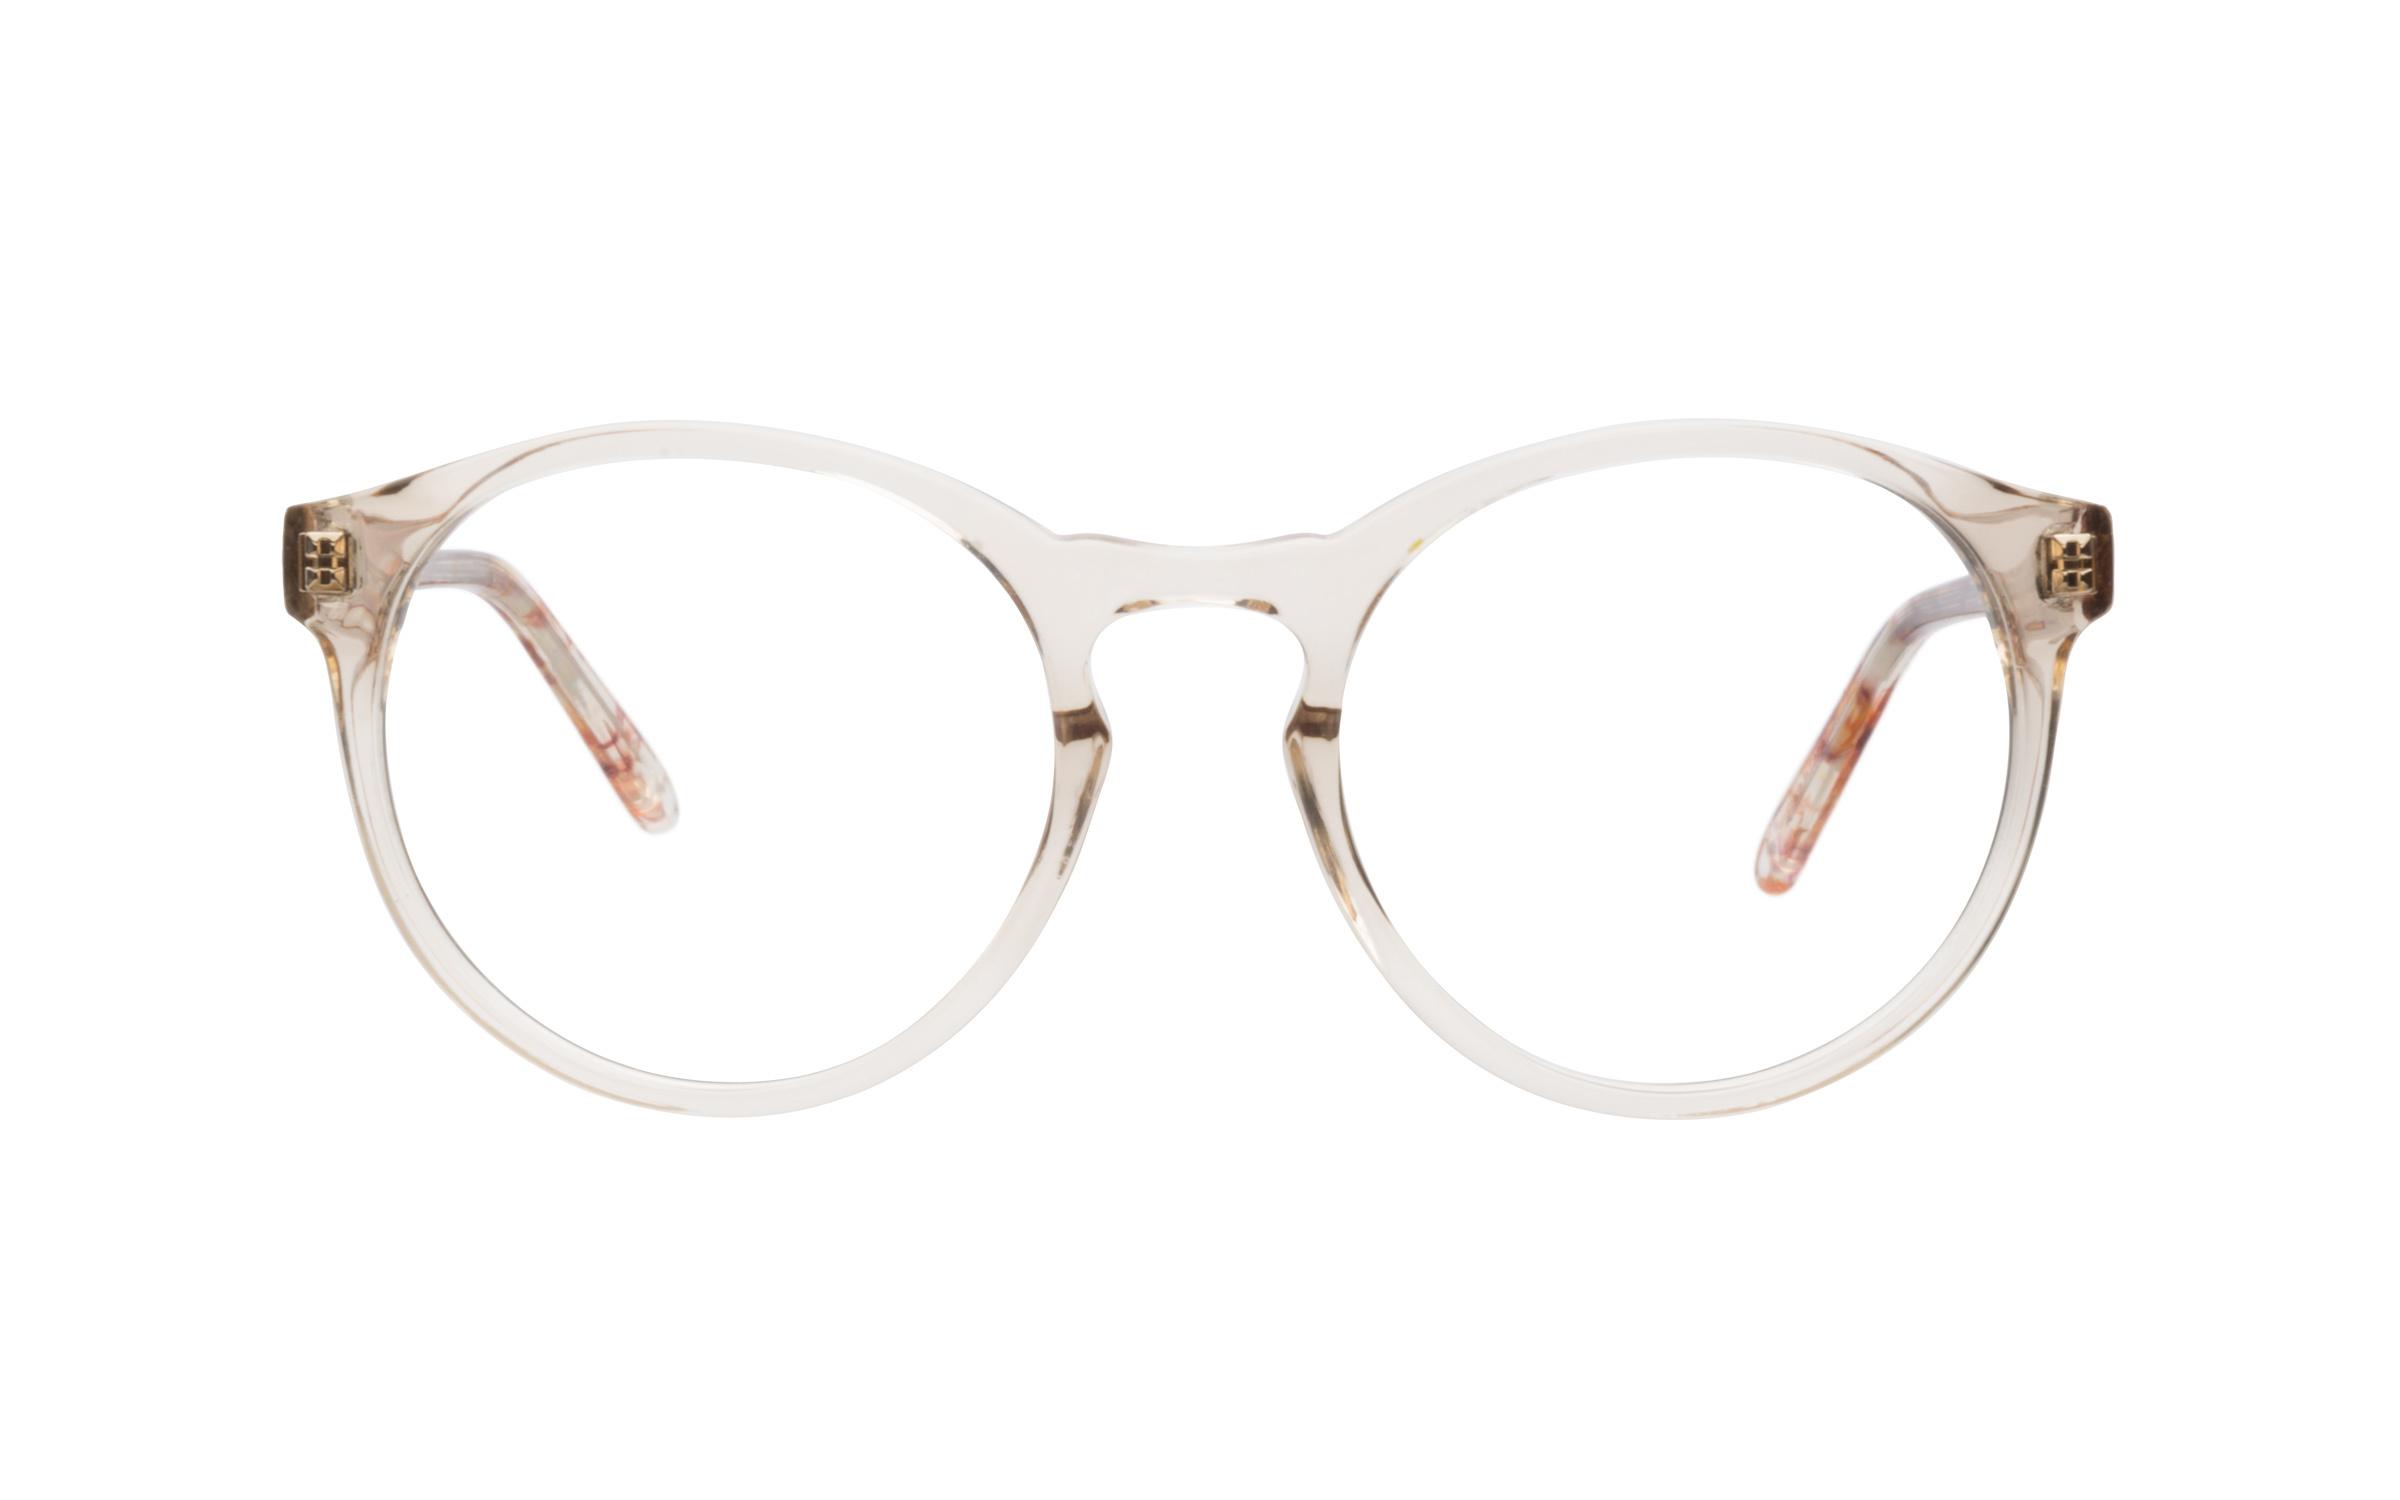 Womens_Oversized_Glasses_BrownClearPink_Love_Online_Coastal